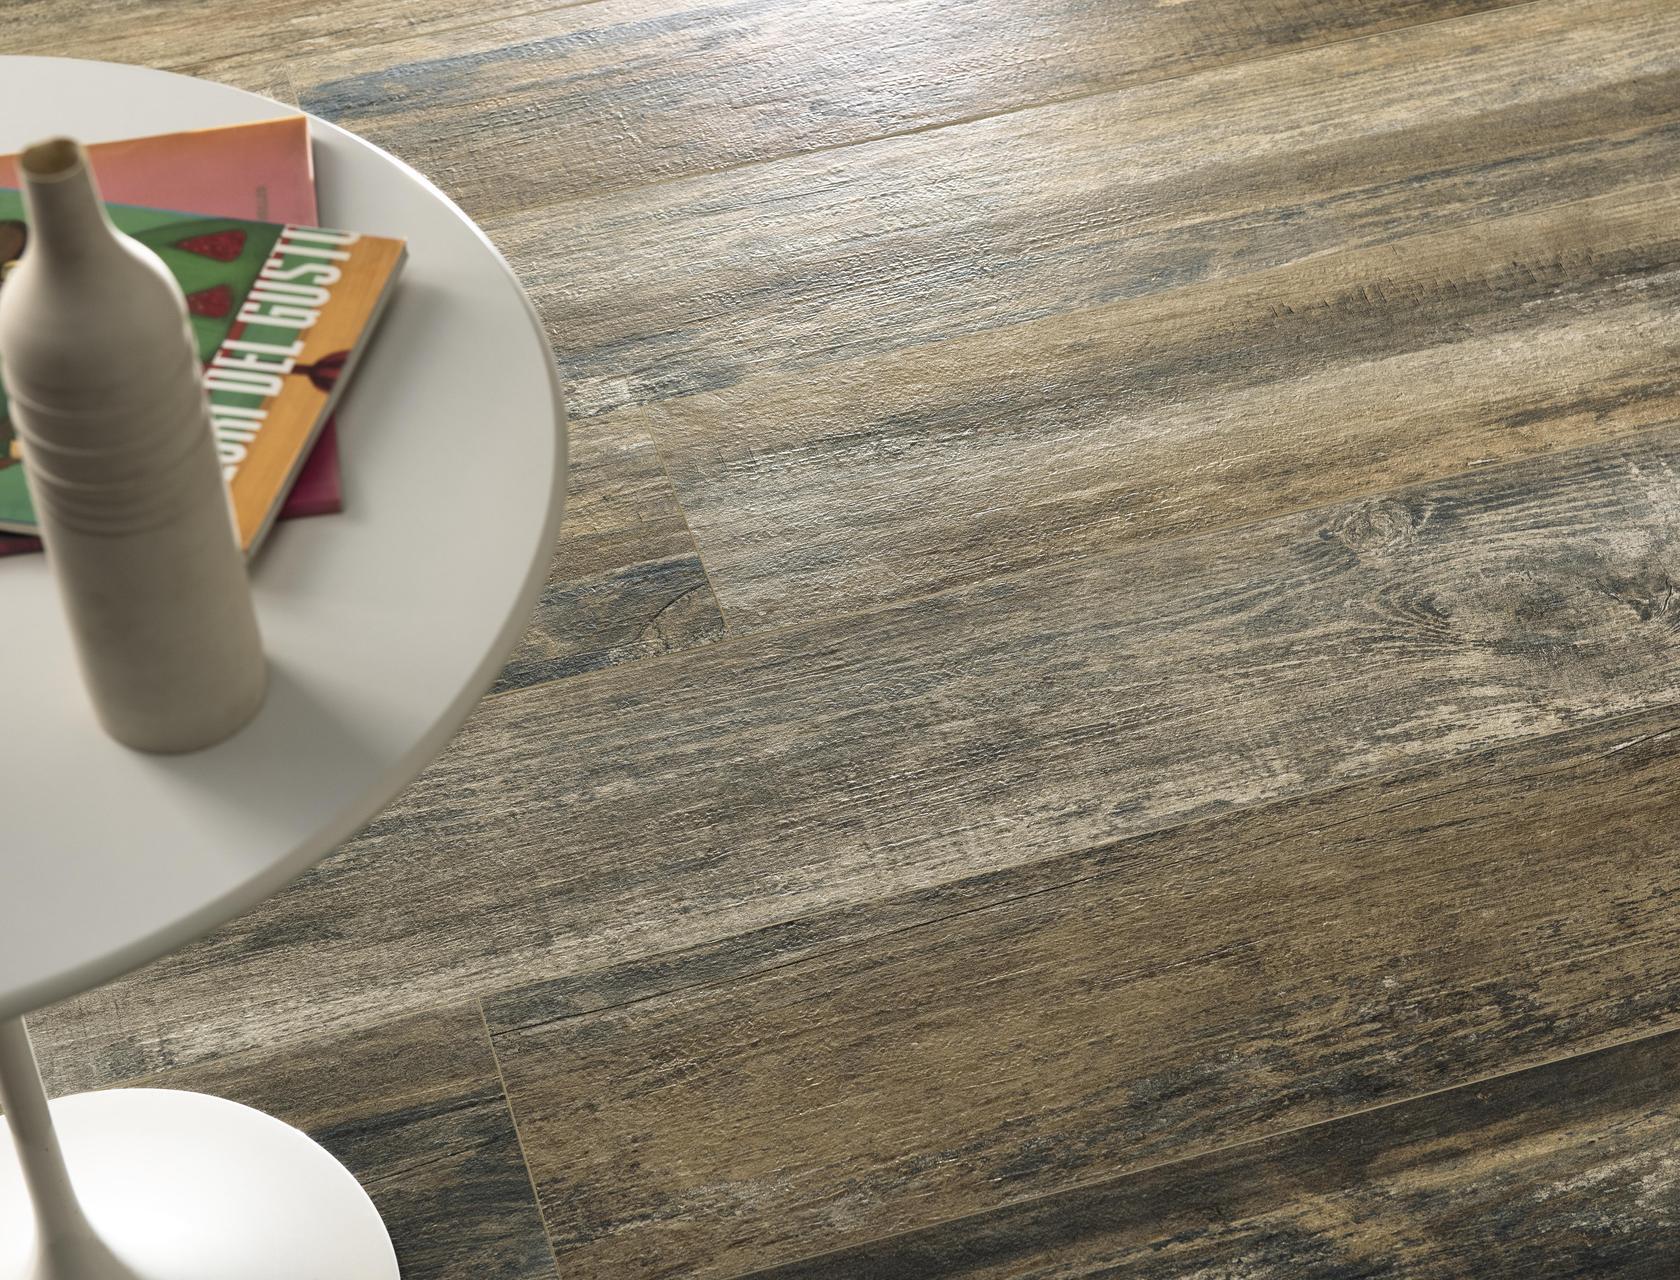 Porcelain stoneware tile flooring installation tips